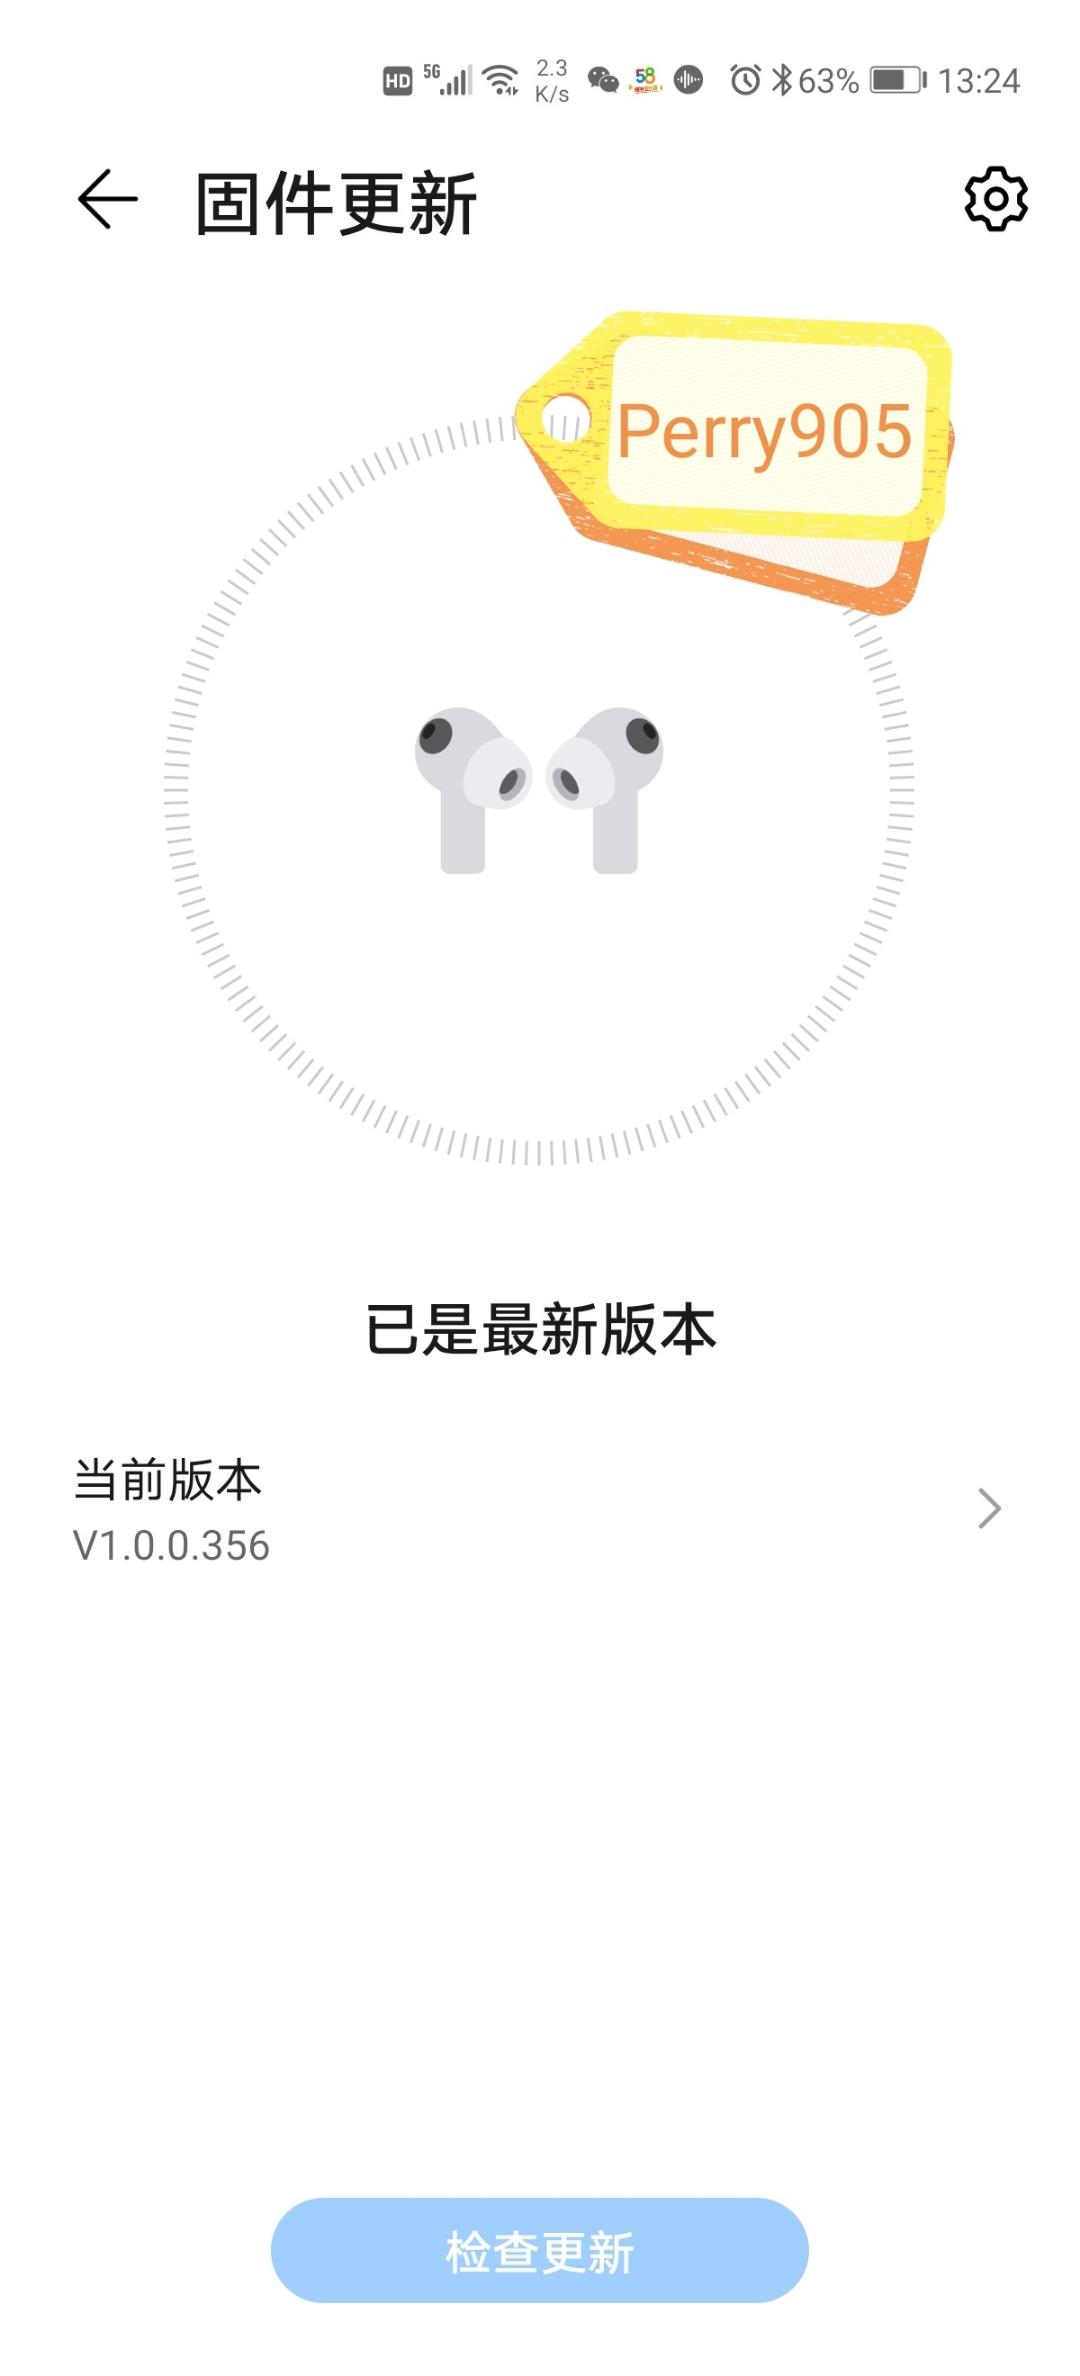 Screenshot_20210329_132410_com.huawei.smarthome_edit_387466250231501.jpg